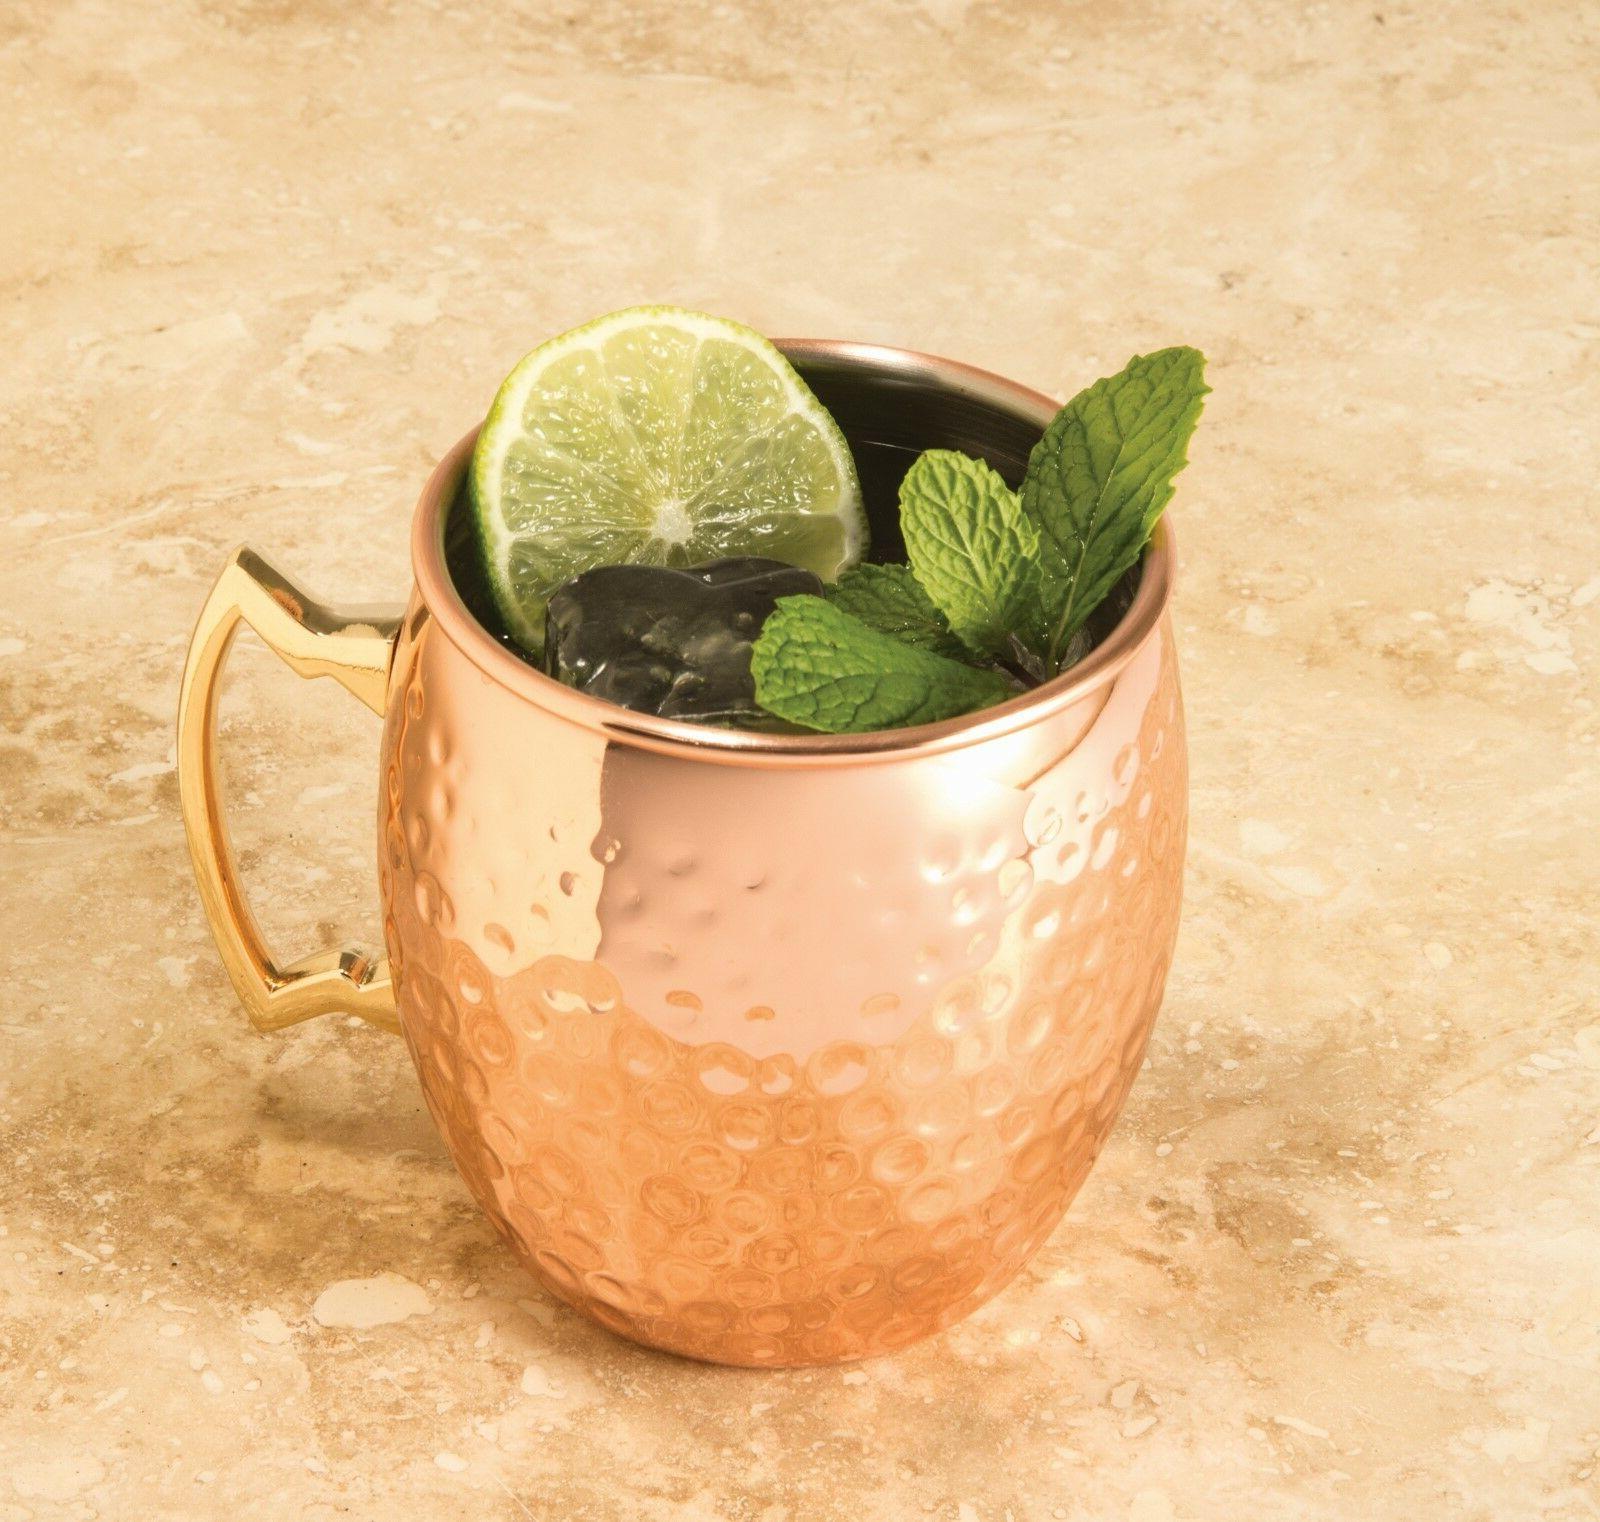 SET 20 MUGS CUPS mug FAST